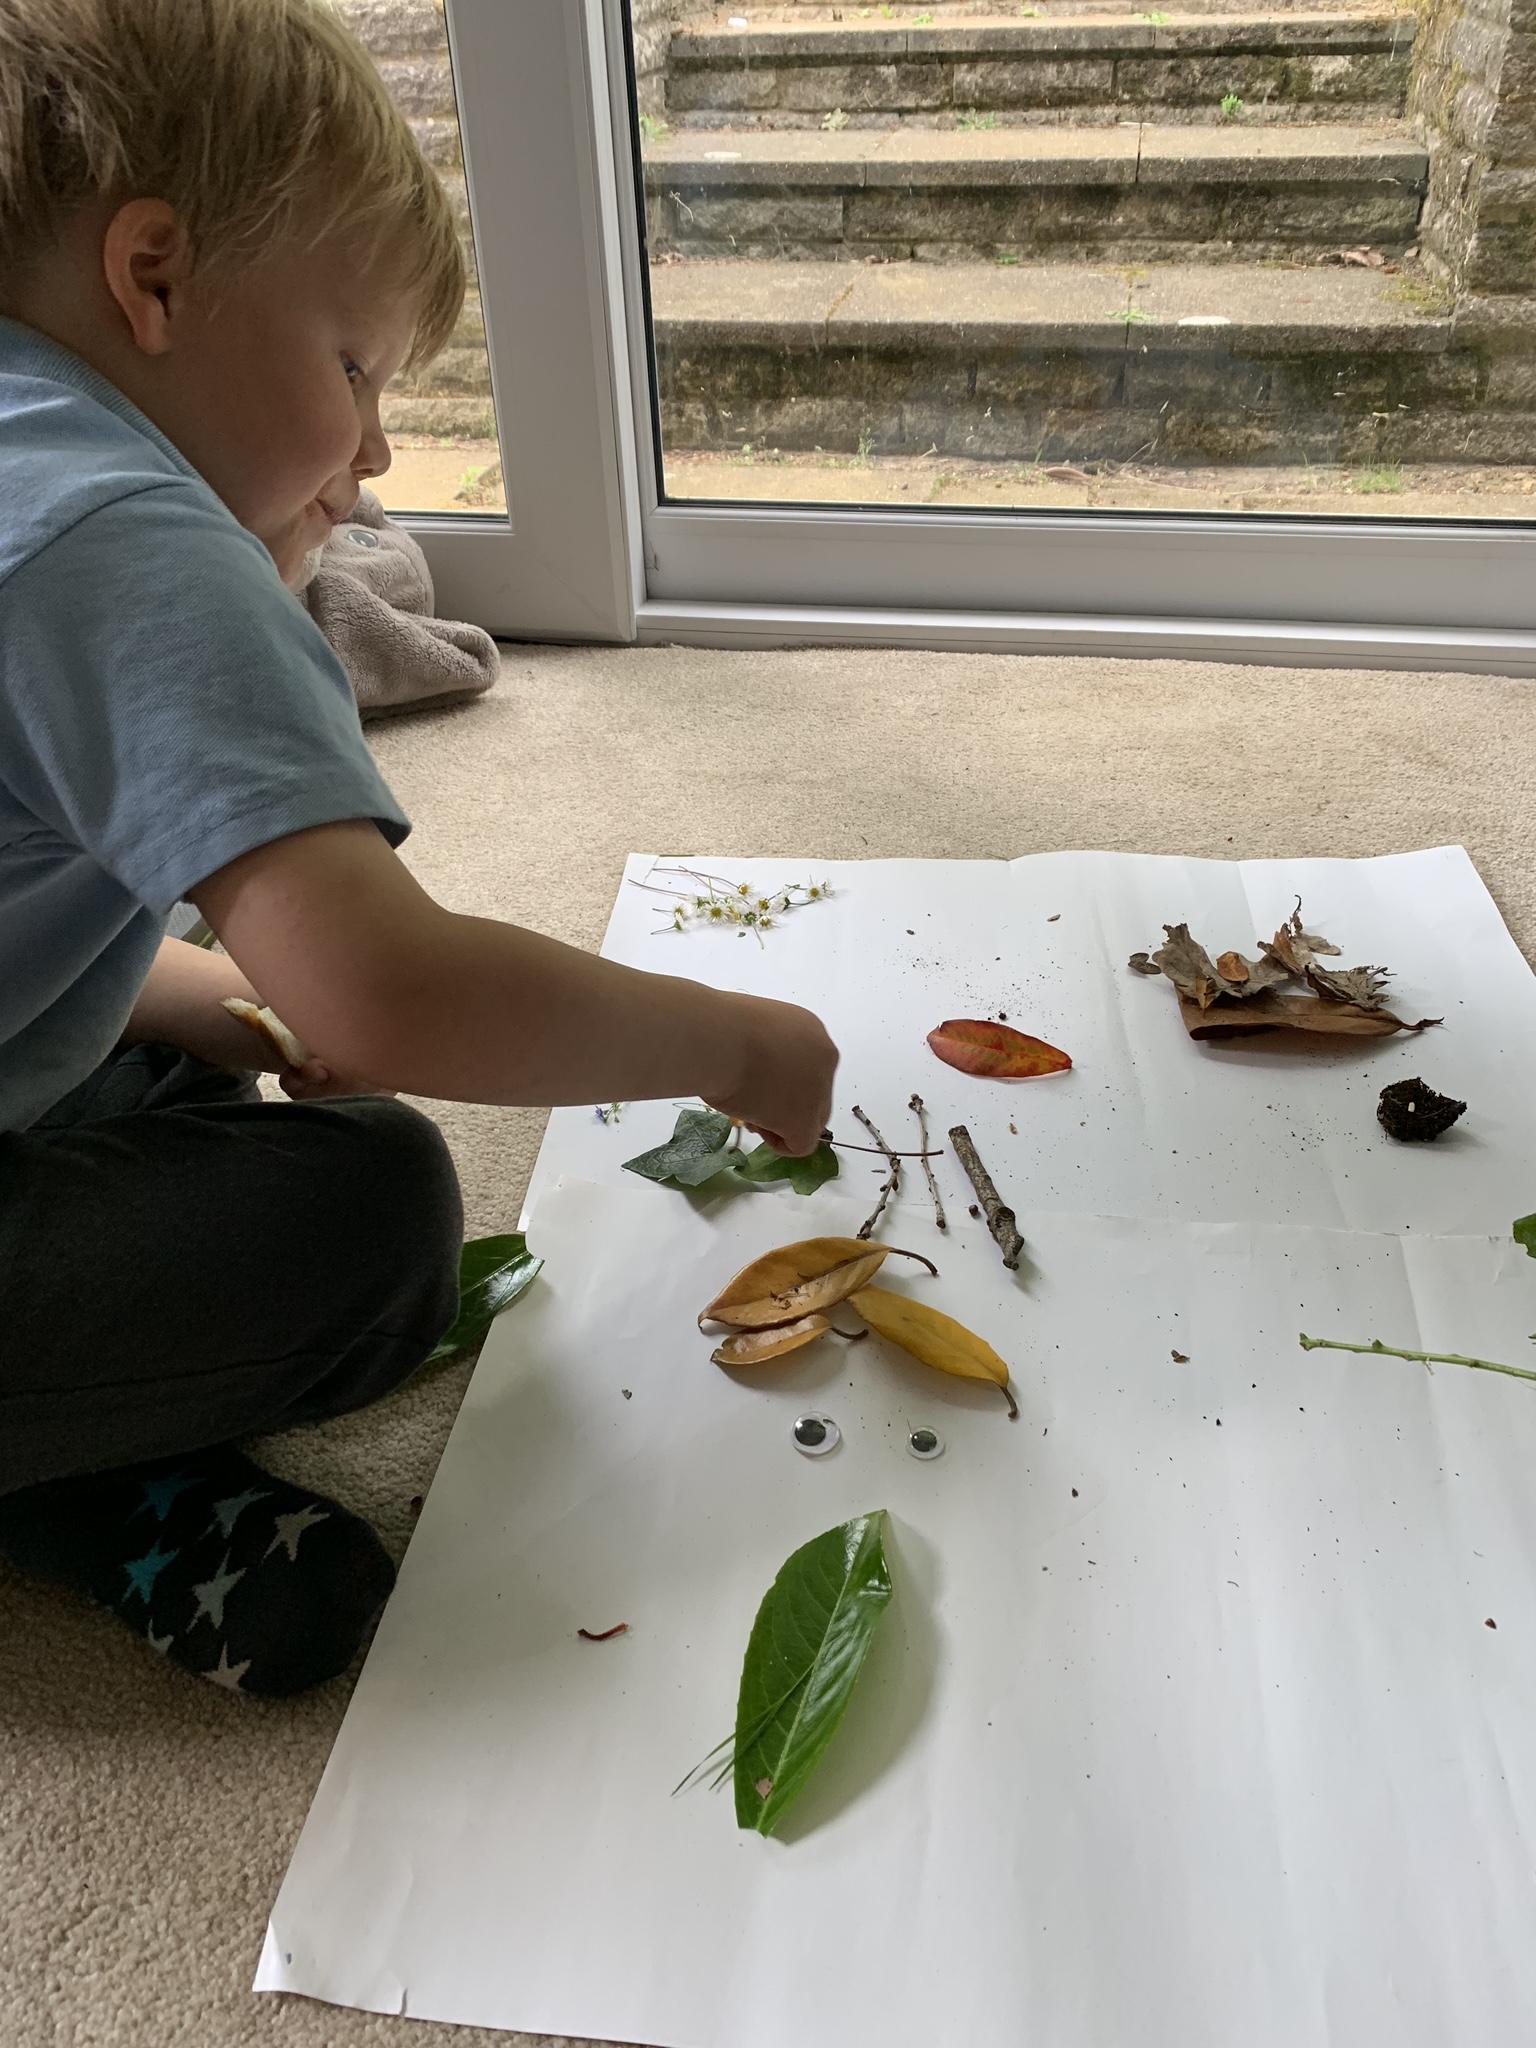 Making nature creatures